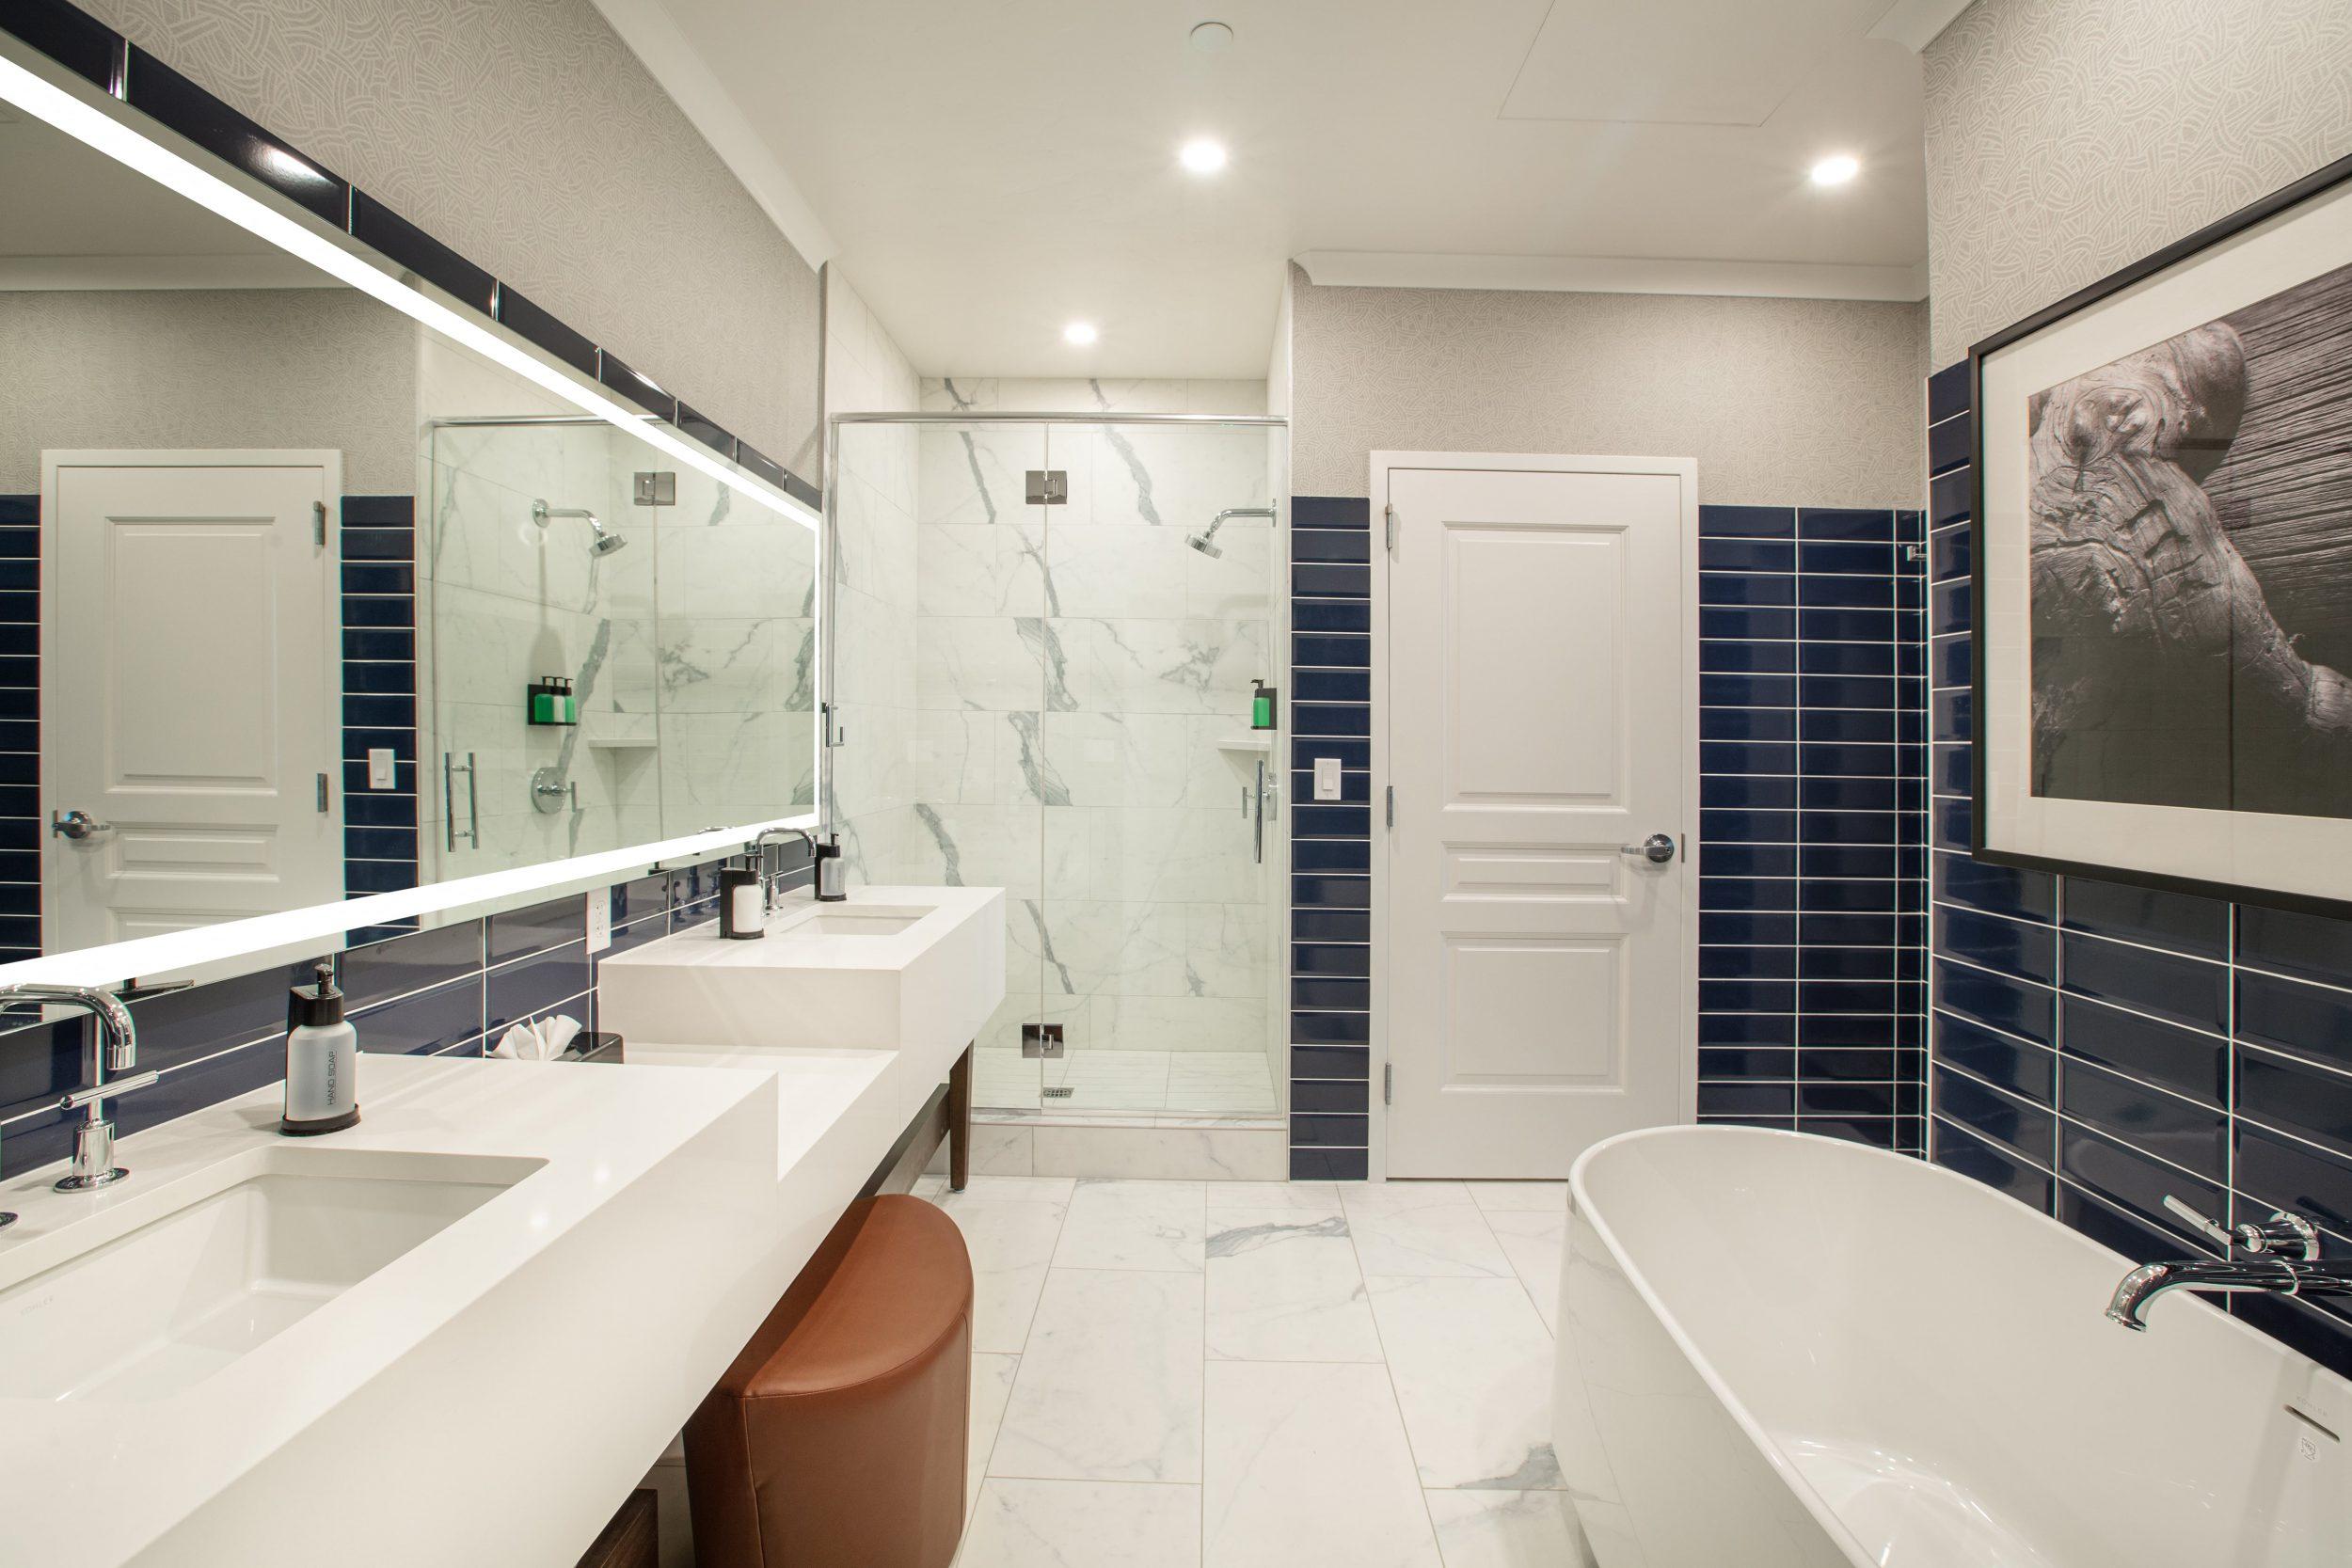 Bathroom with Soker Tub